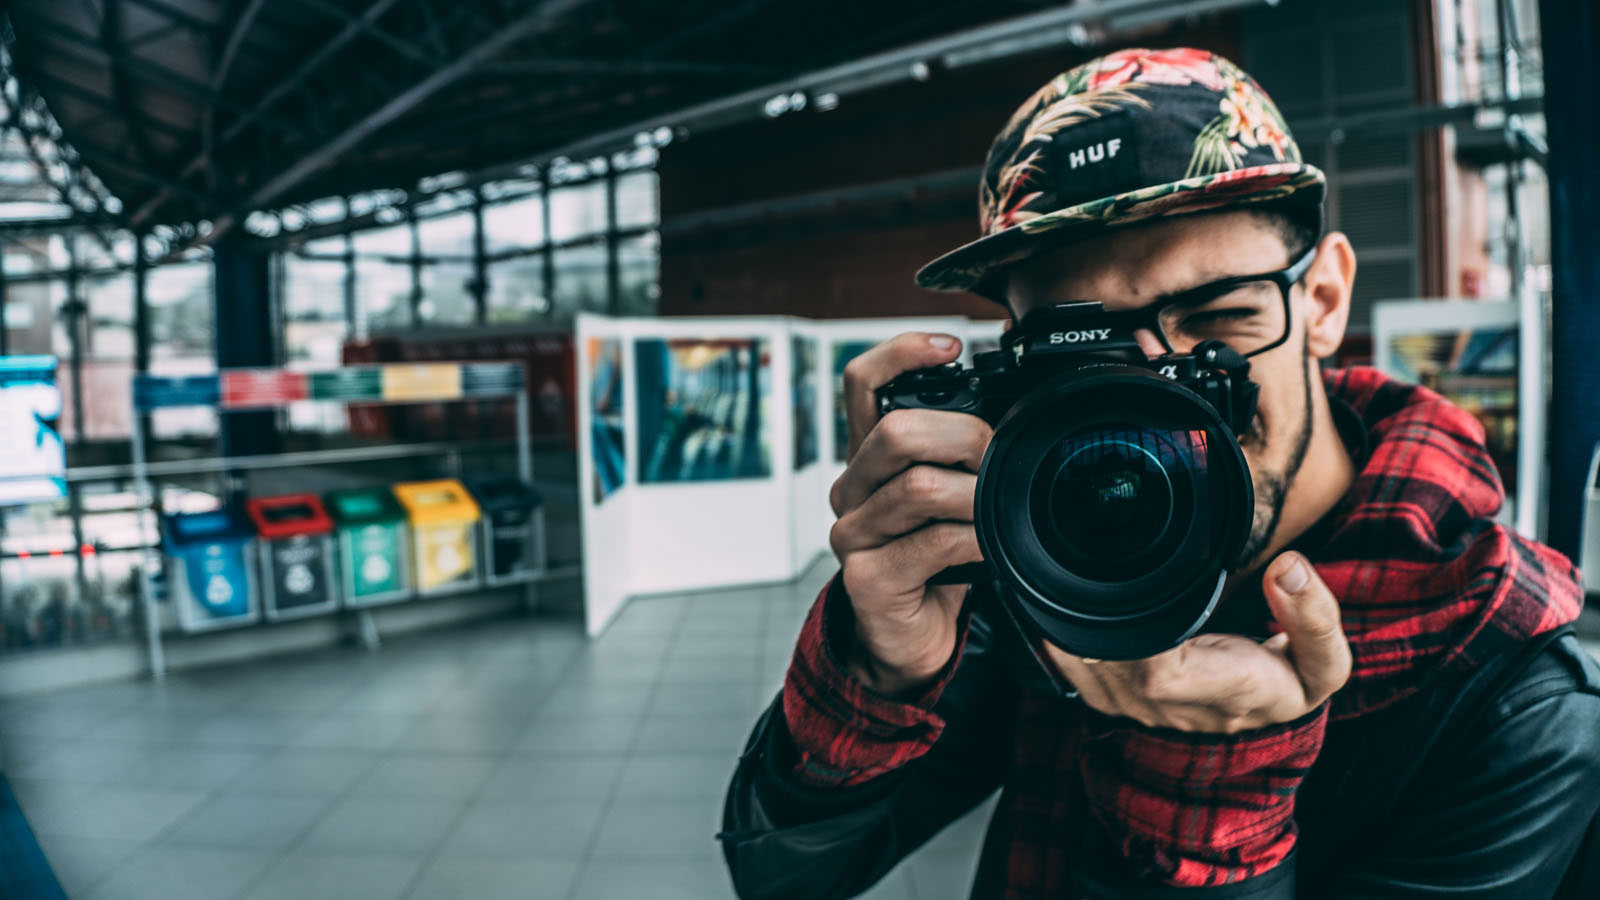 Goldener Schnitt Fotografie Schärfe Fokus Verteilung Kamera